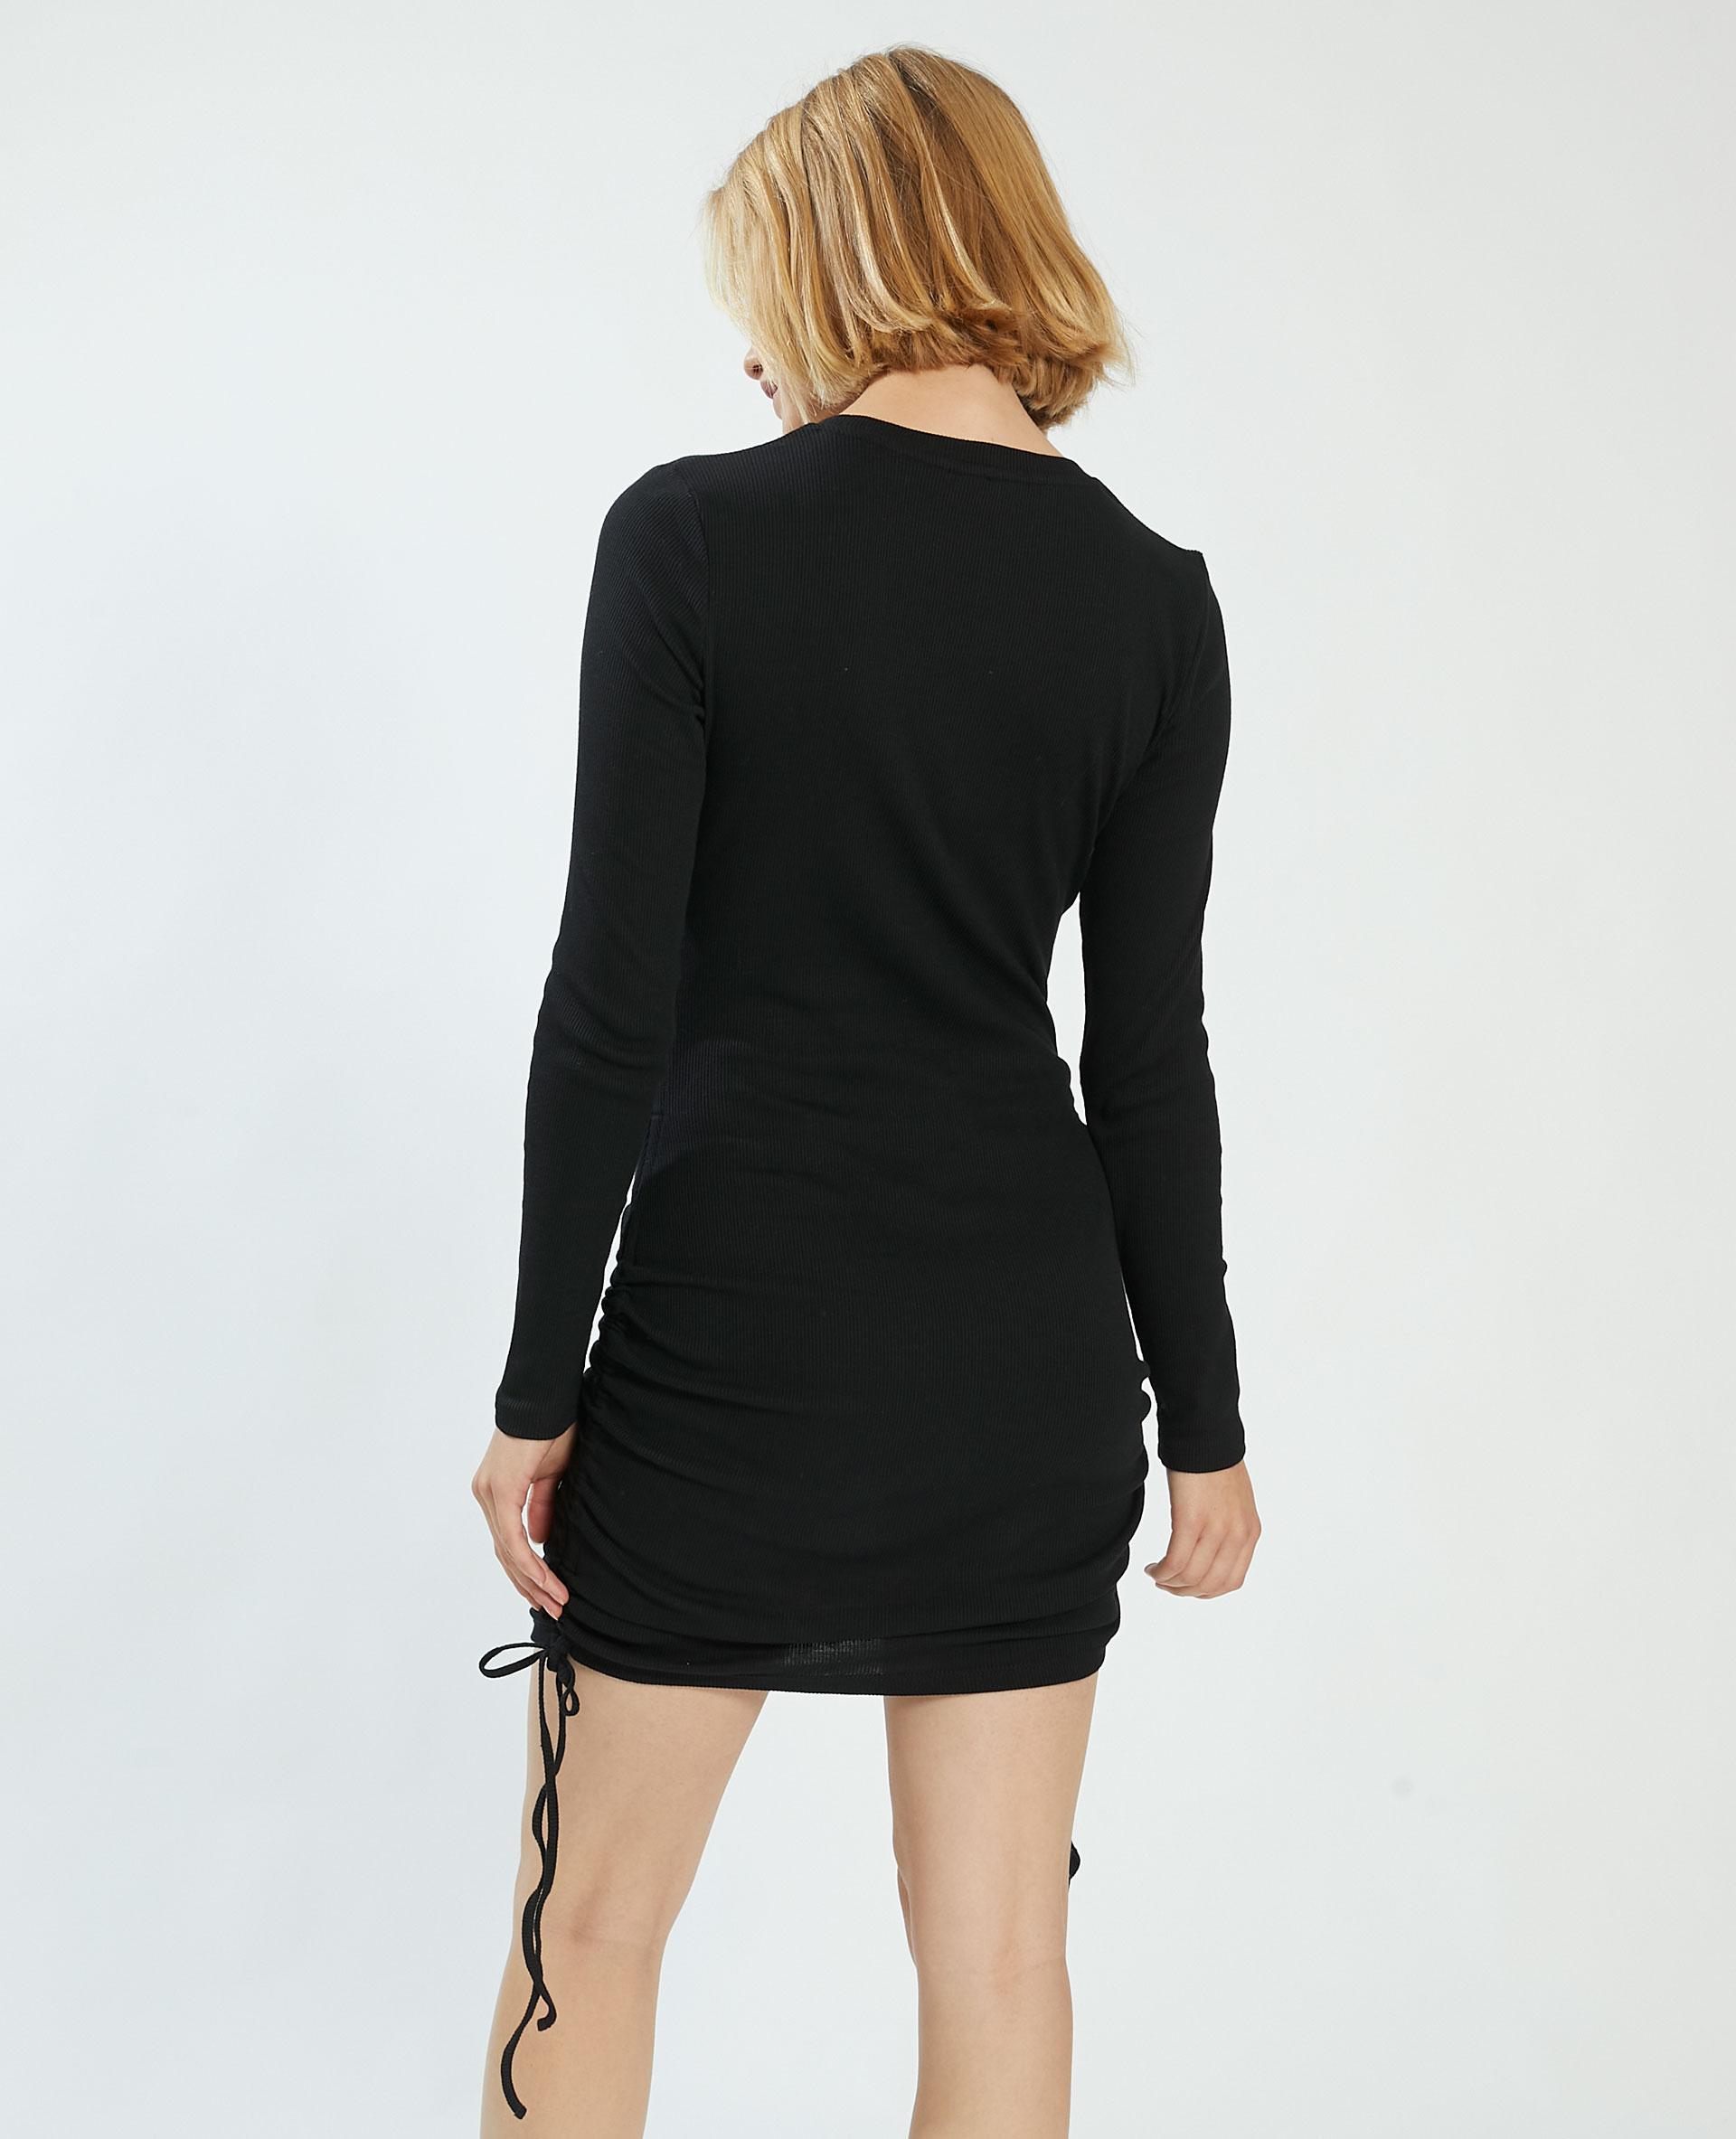 Robe côtelée noir - Pimkie